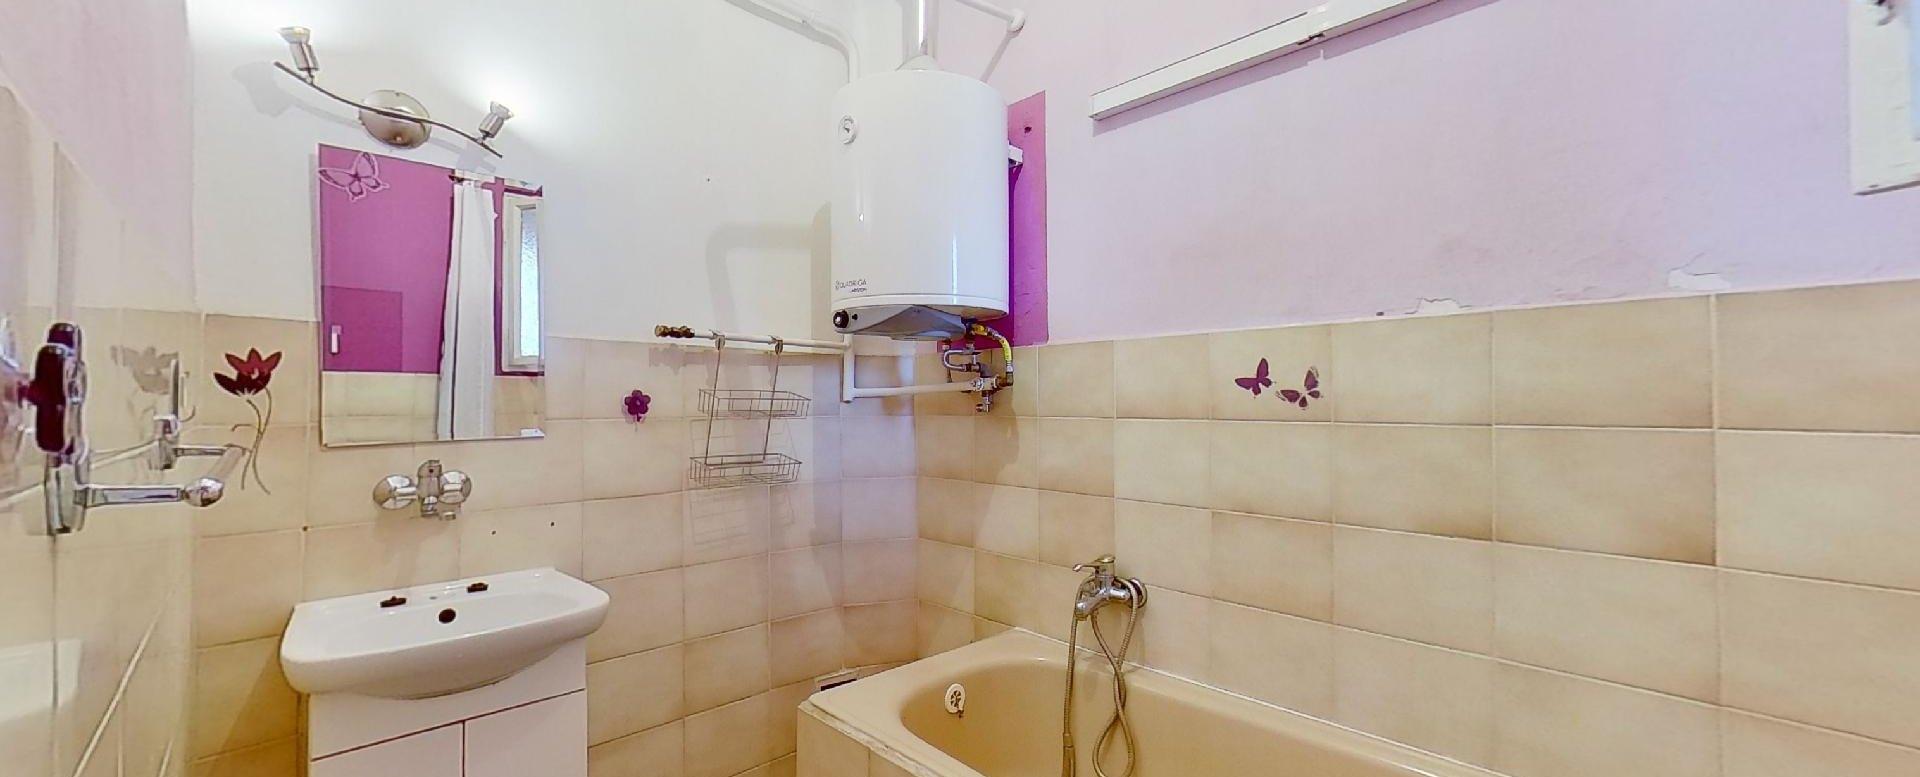 kúpaľňa s vaňou